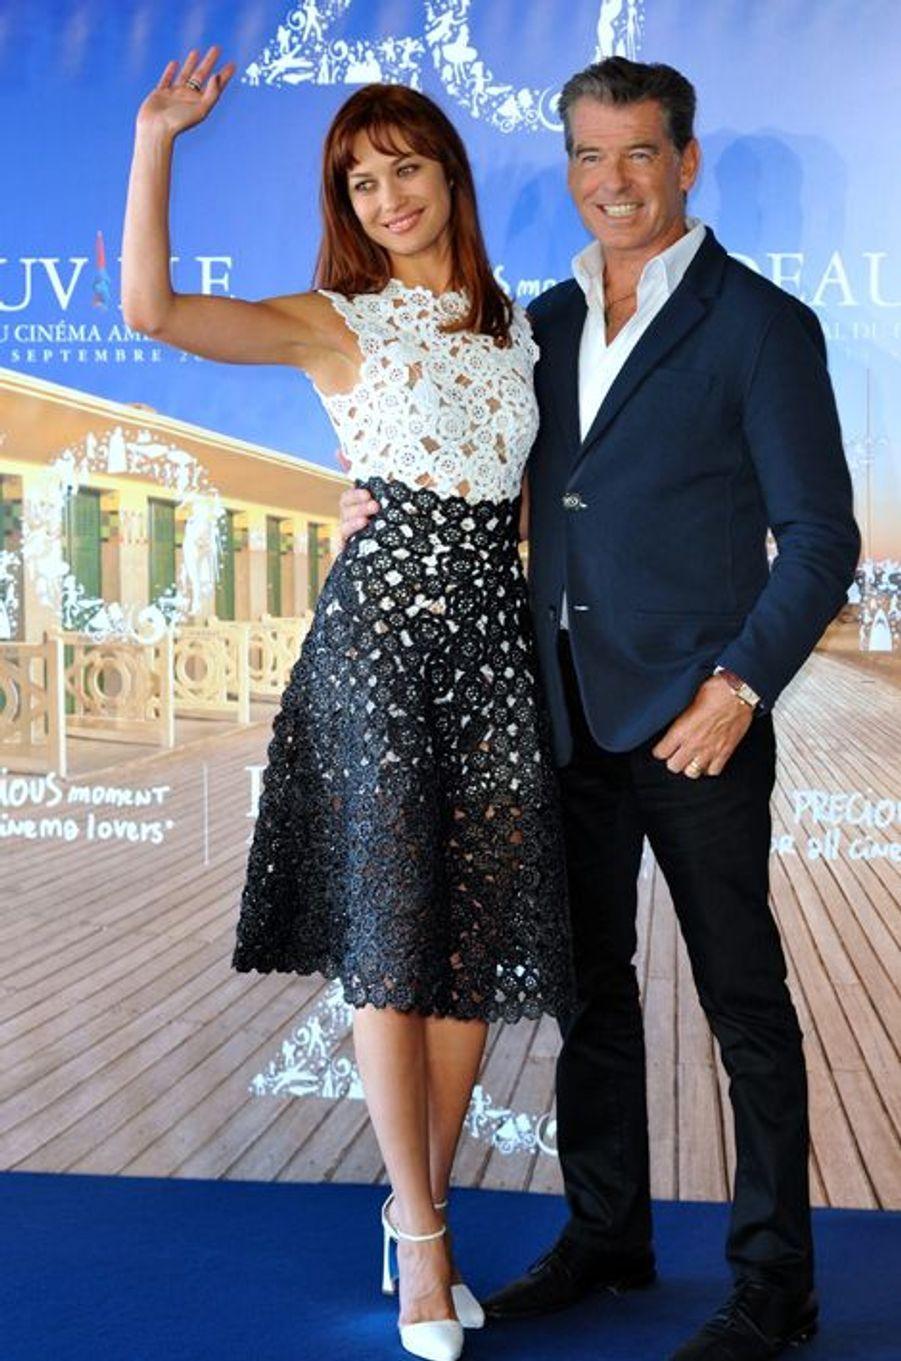 Pierce Brosnan et Olga Kurylenko